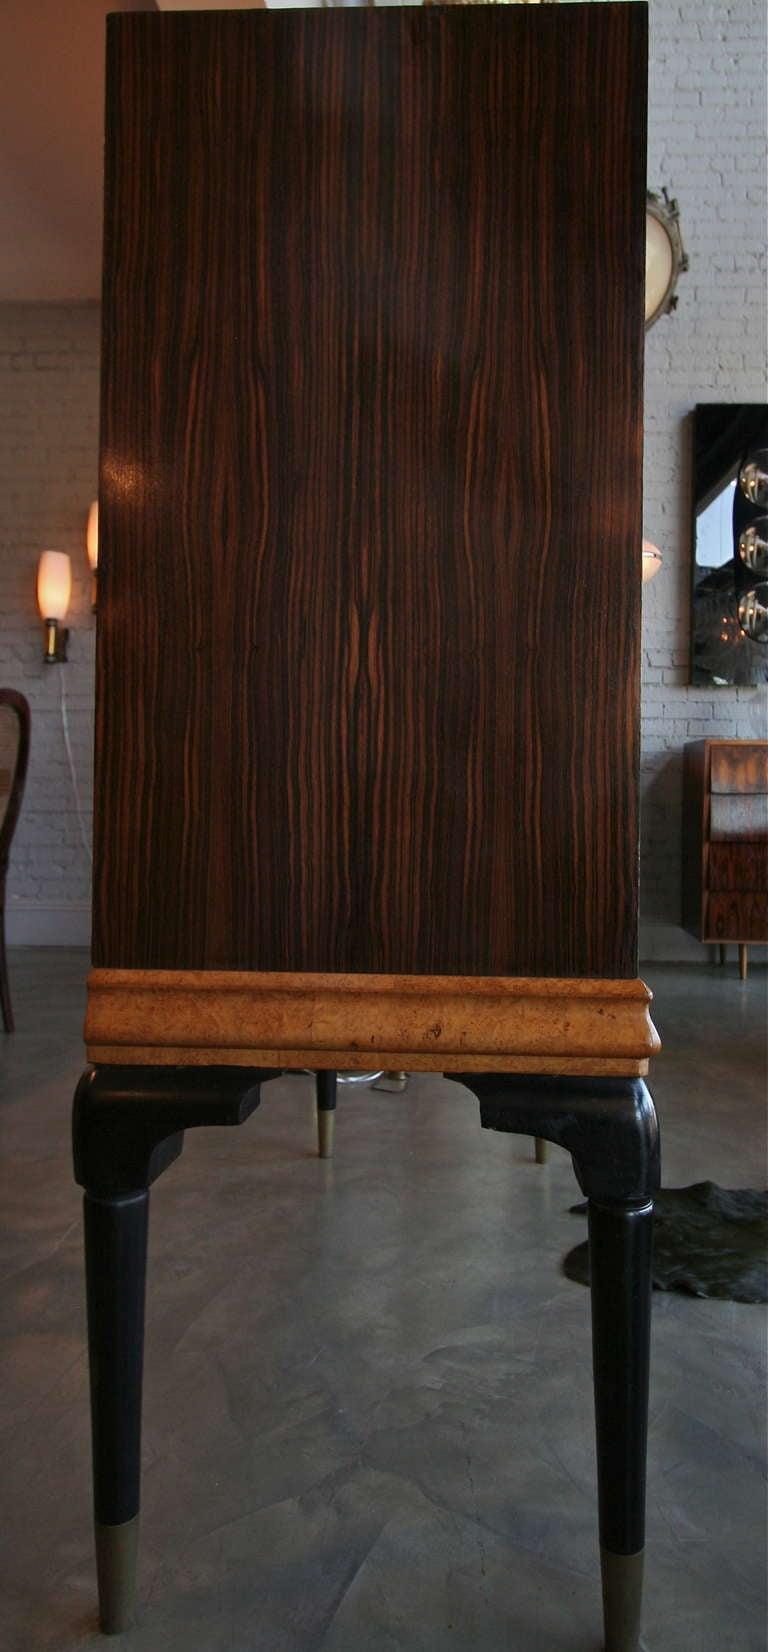 1940s Macassar Ebony and Burl Wood Bar Cabinet by Osvaldo Borsani For Sale 2